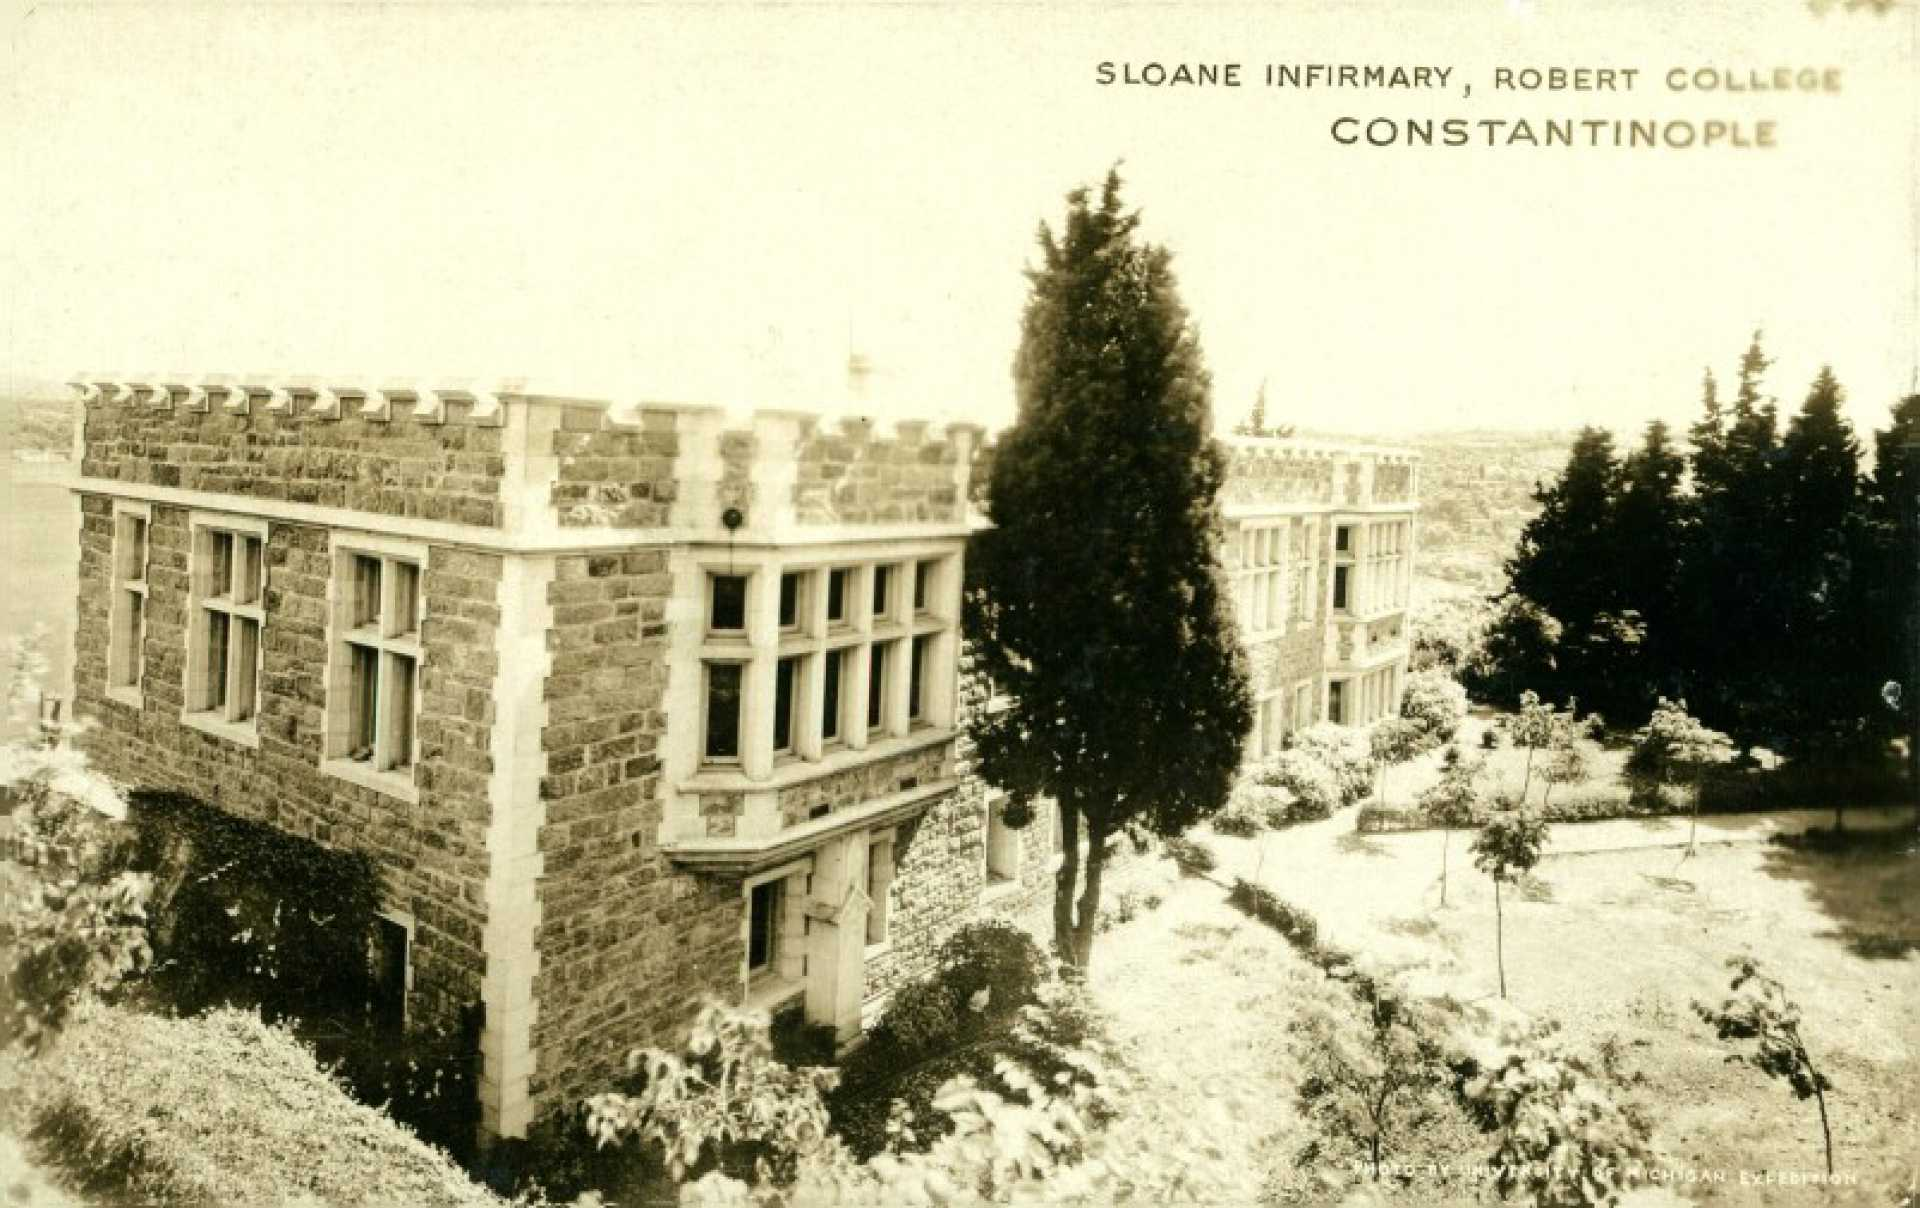 Sloane Infirmary. Robert College. Constantinople